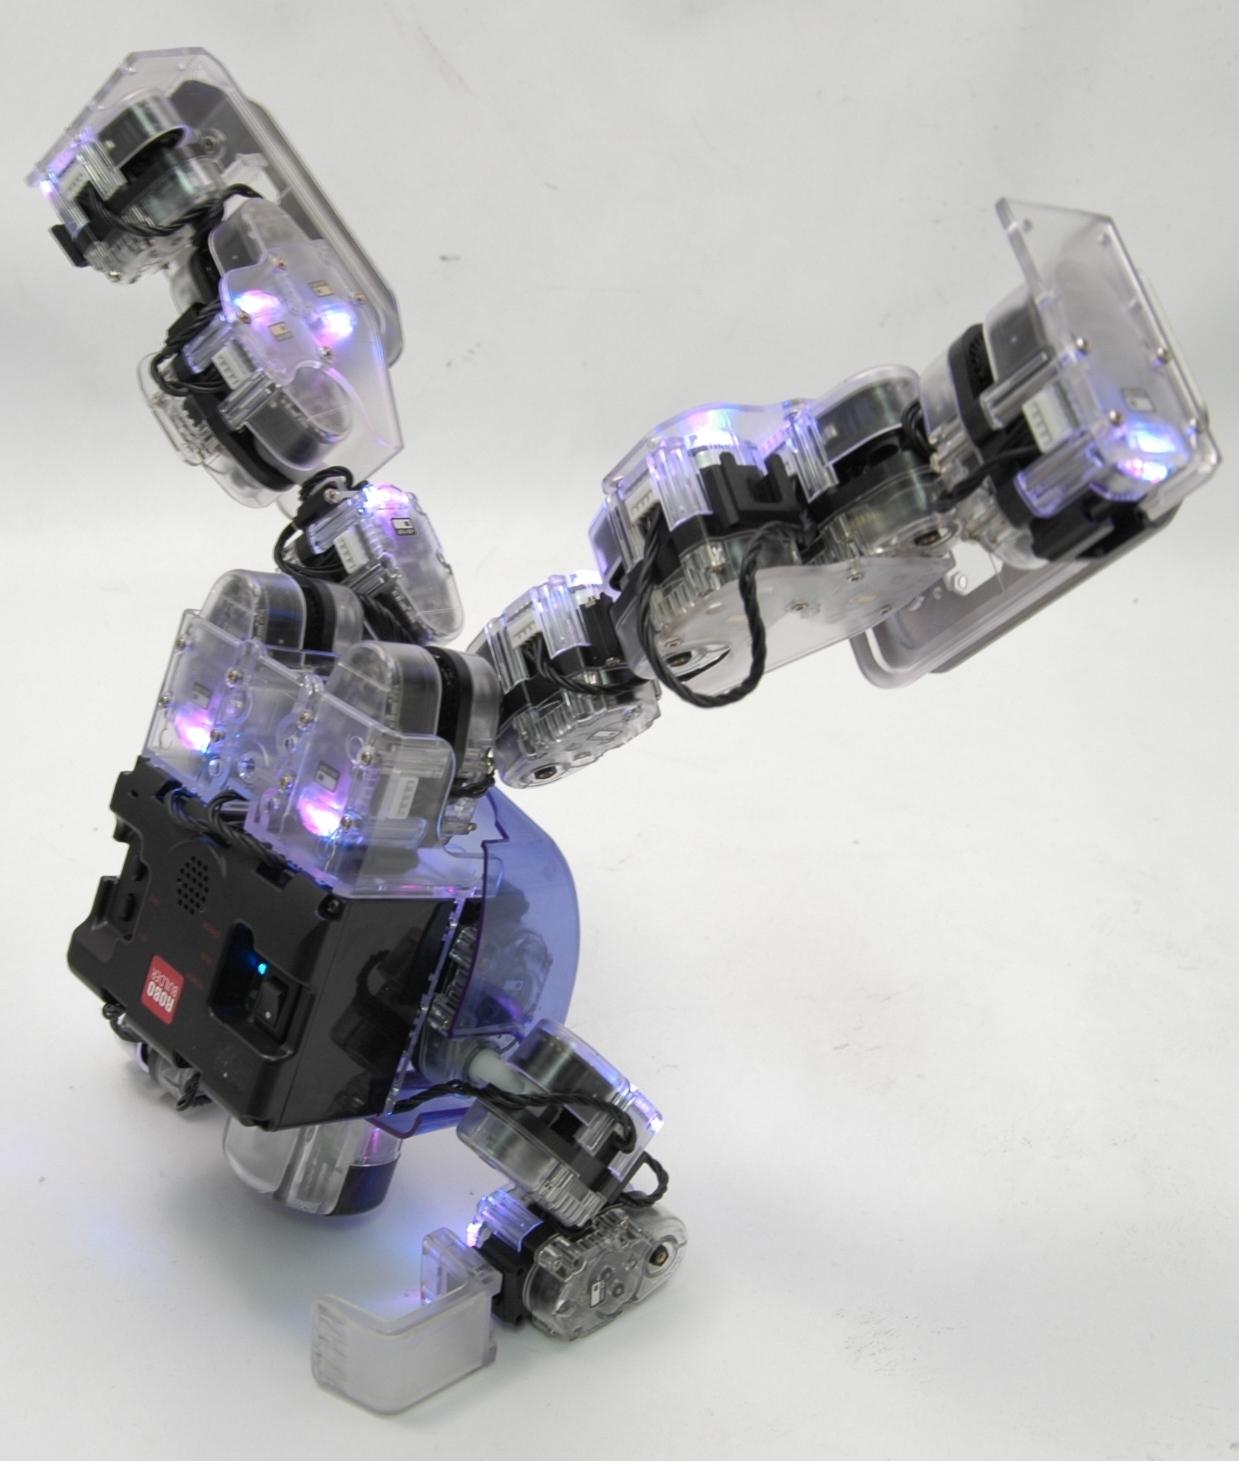 ROBOBUILDER CO.,LTD. Main Image